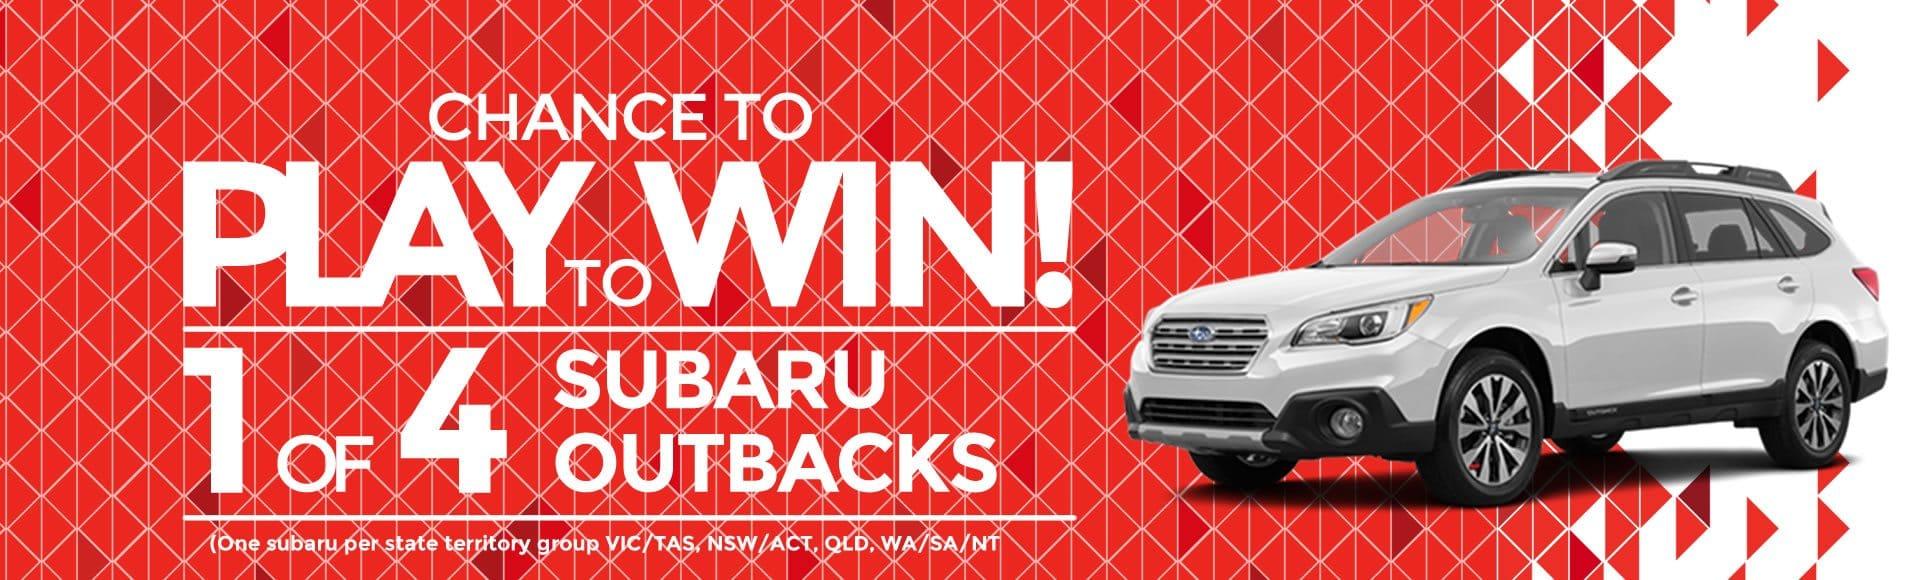 Win 1 of 4 Subaru Outbacks!